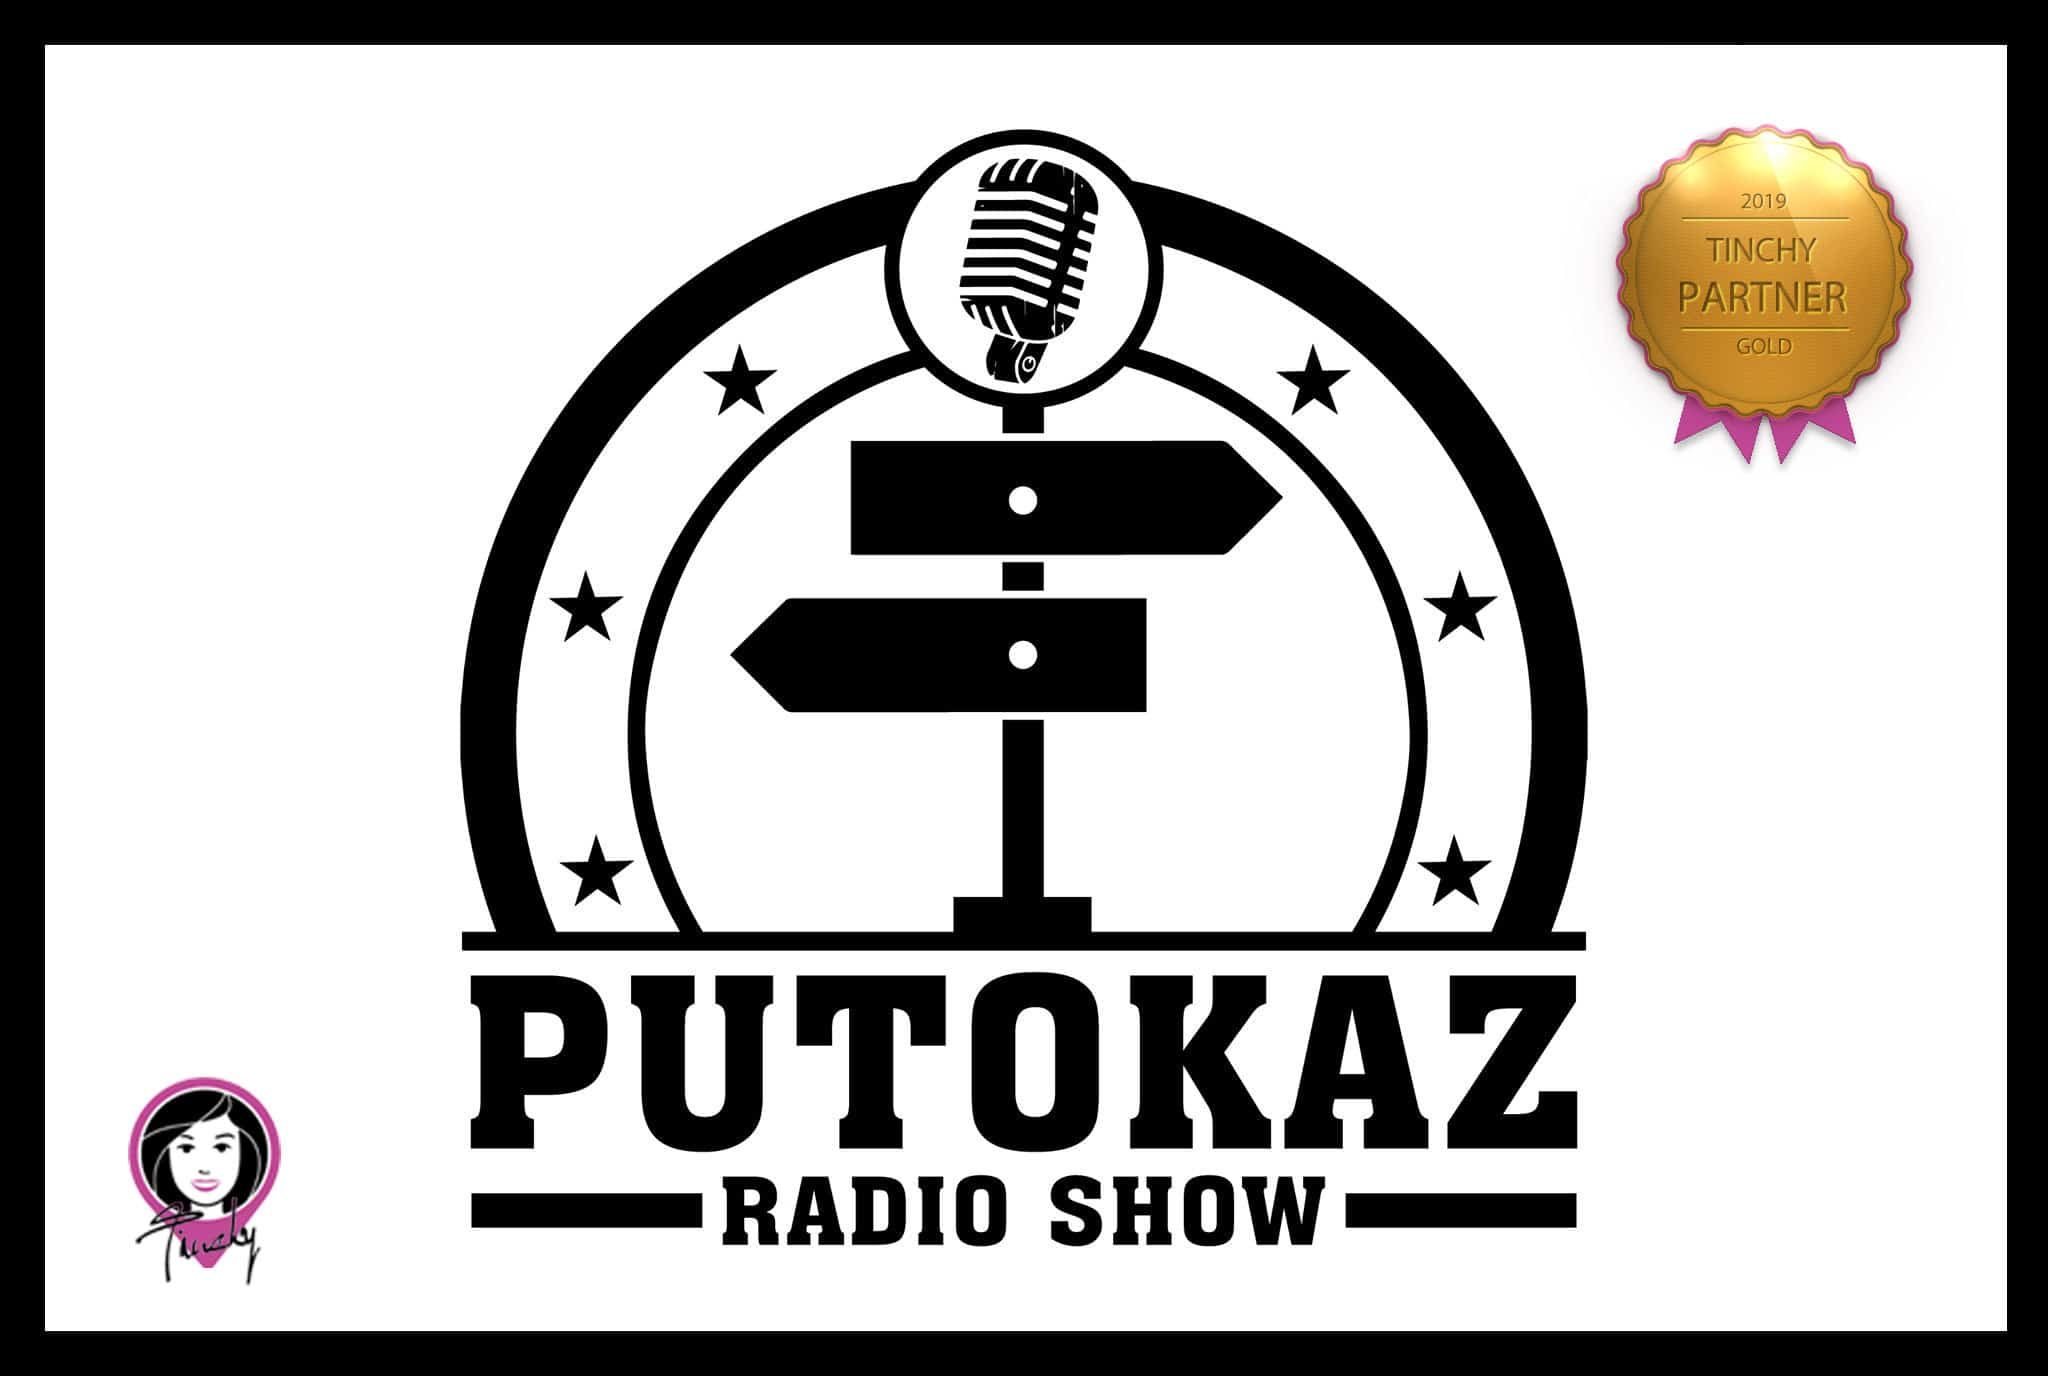 Radio show – Putokaz – Online radio emisija